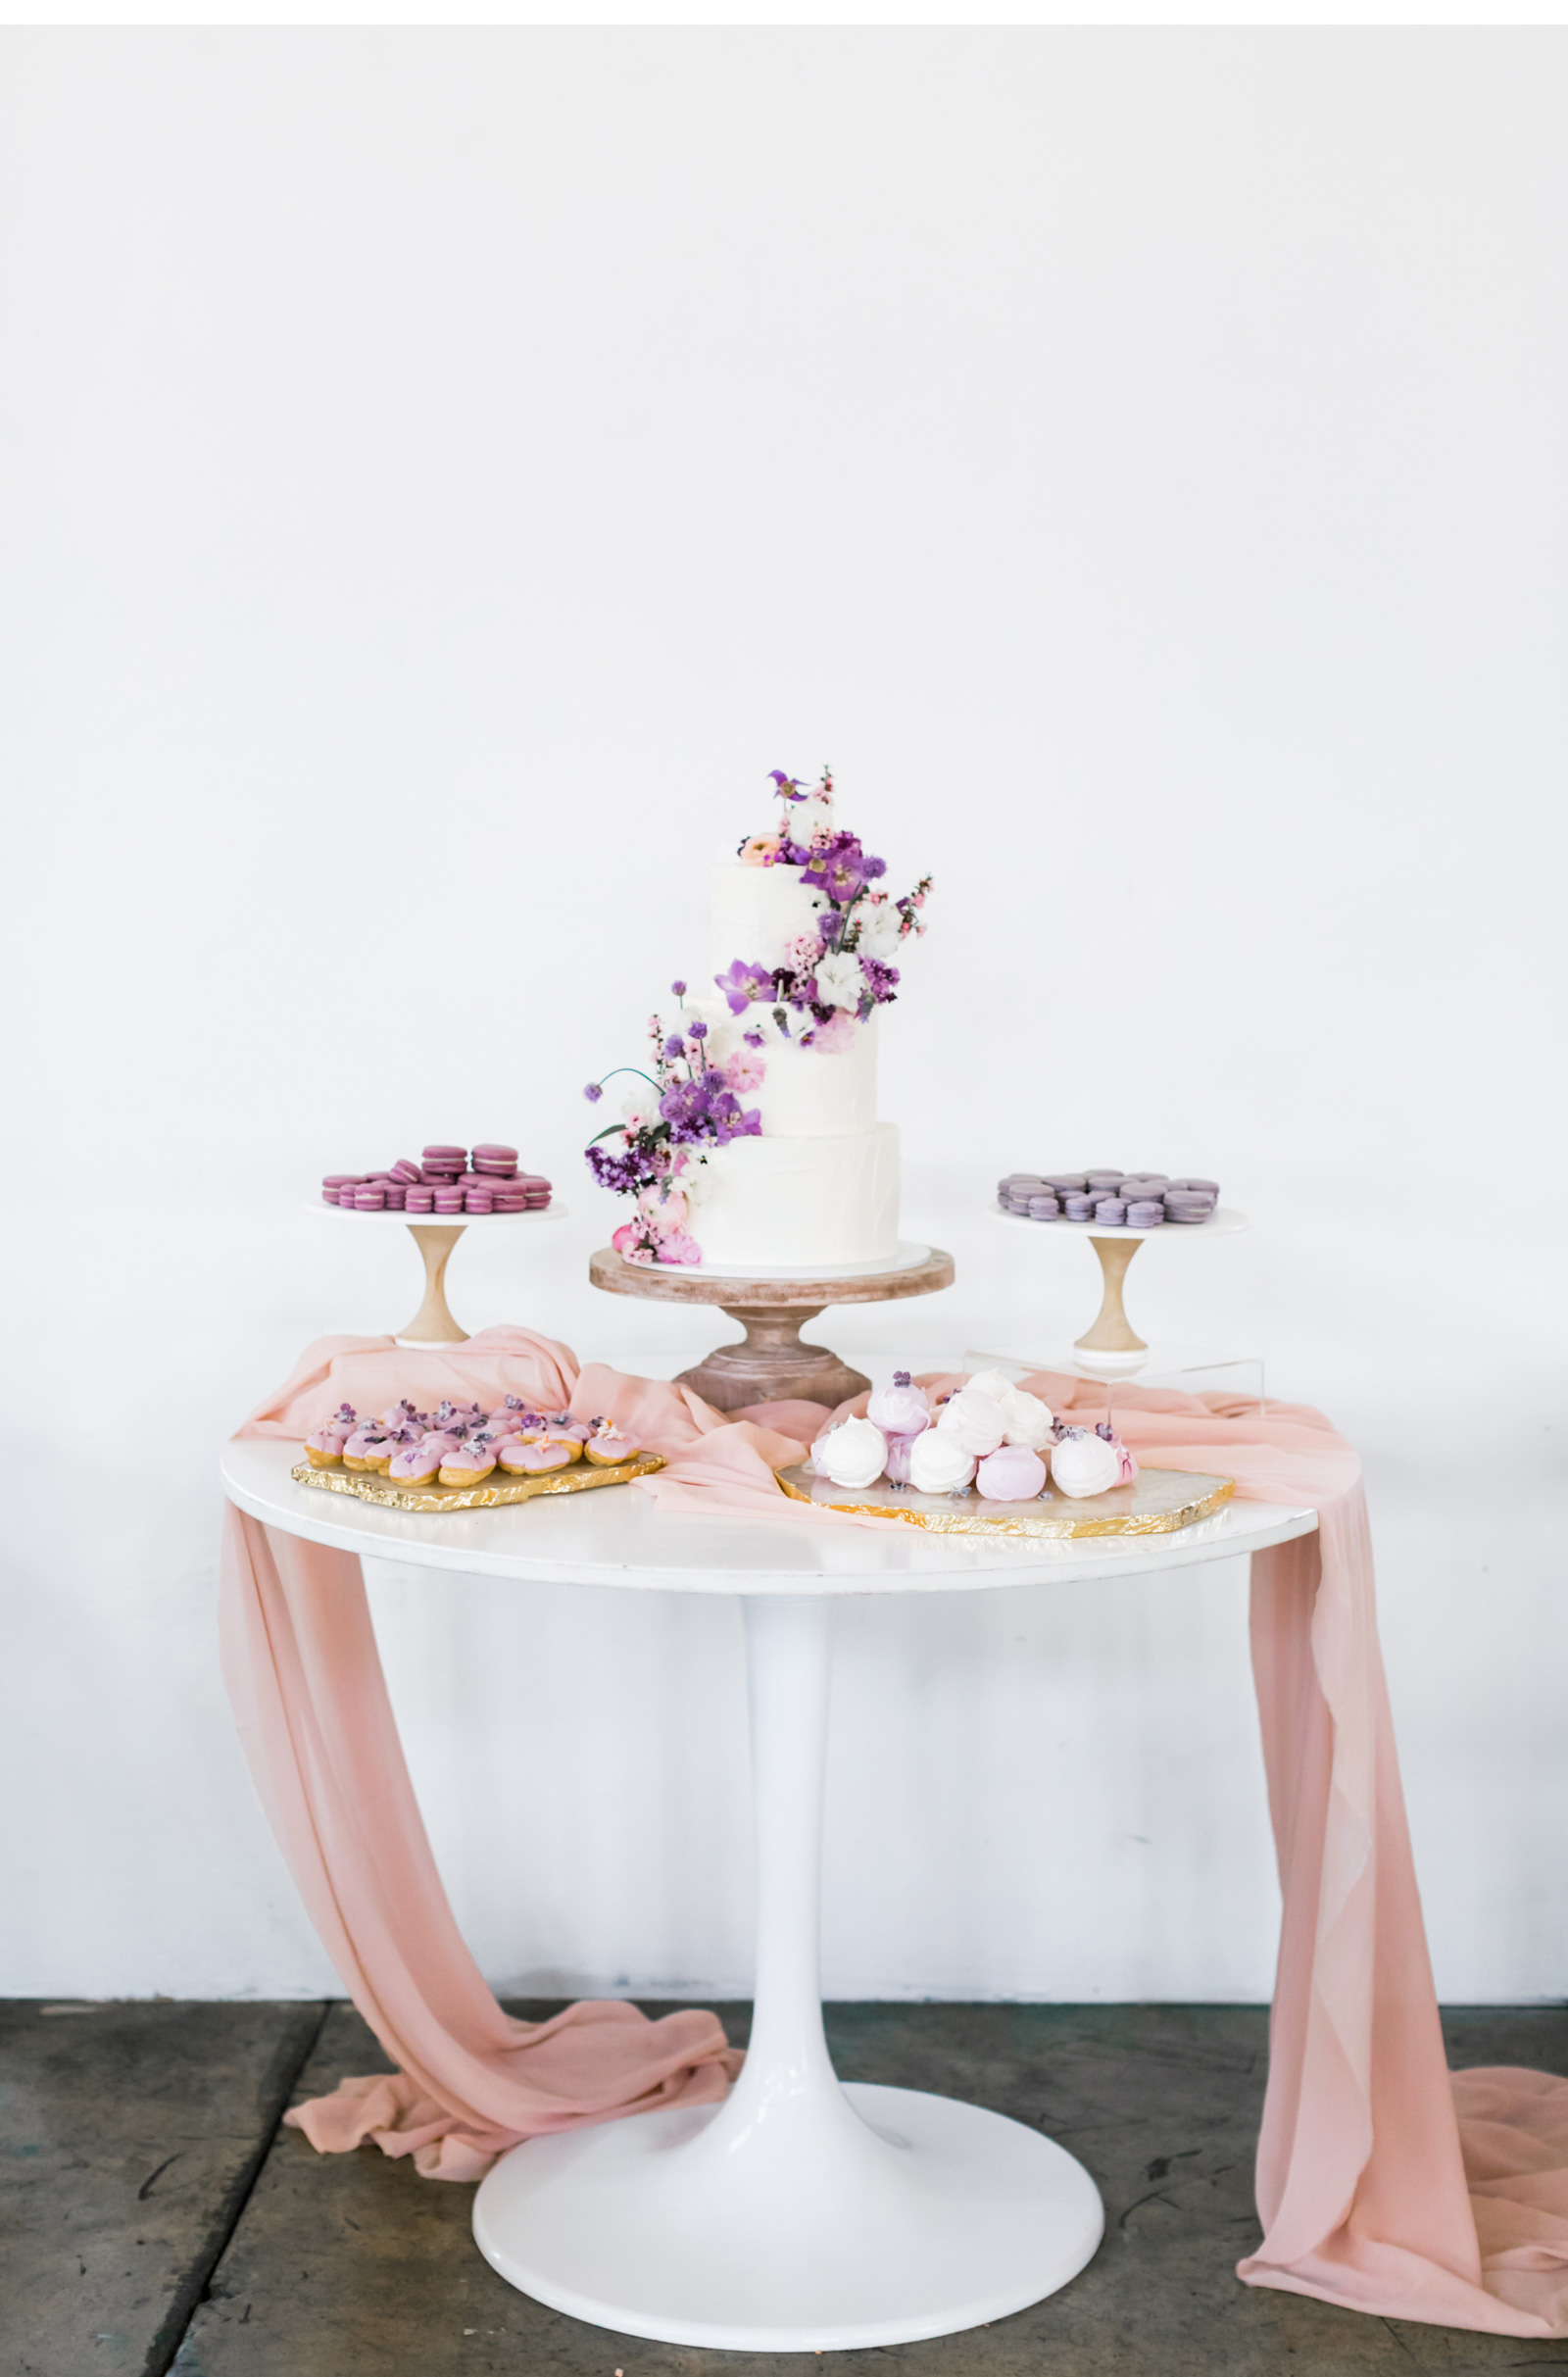 Malibu-Weddings-Natalie-Schutt-Photography-Inspired-by-This_12.jpg